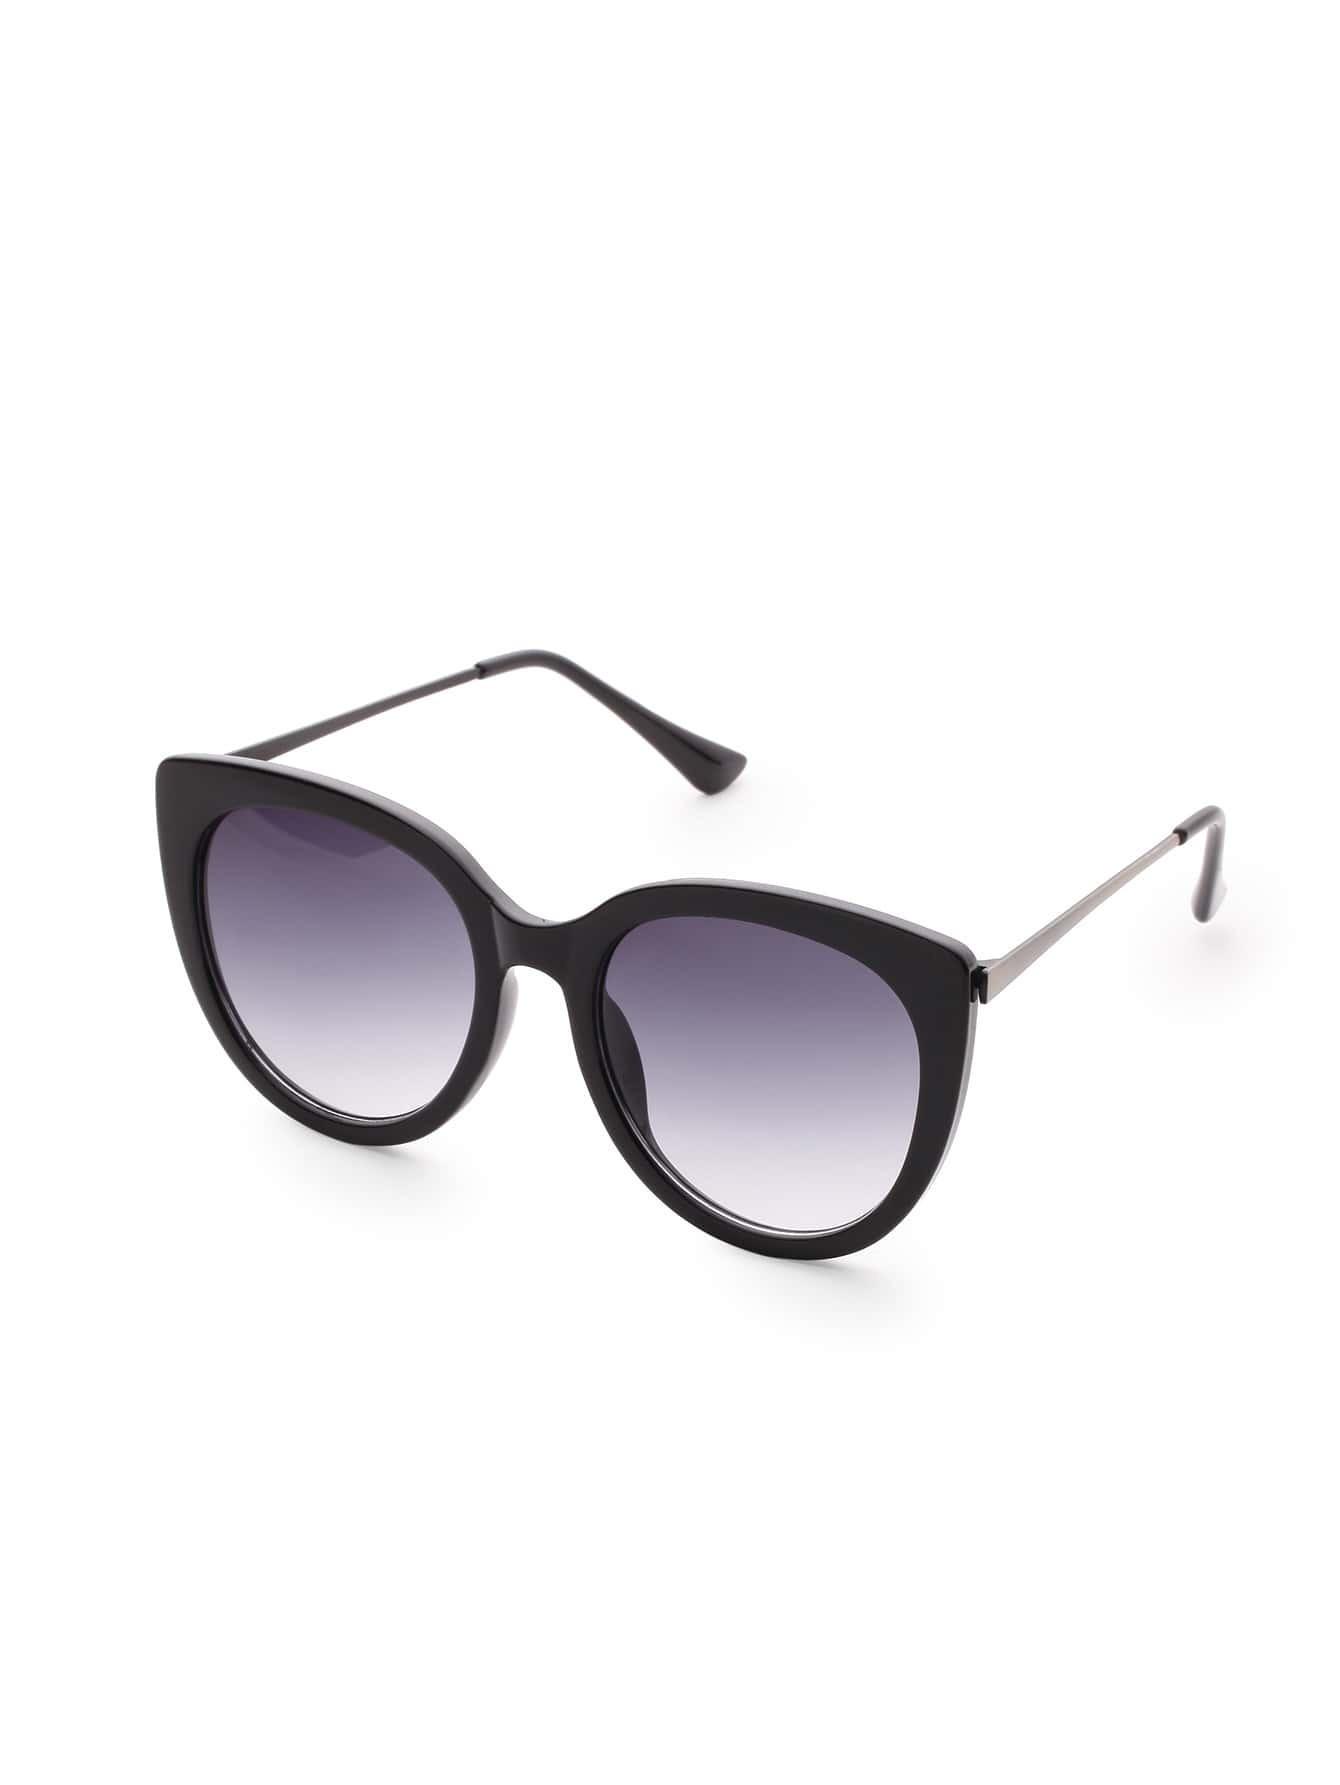 Black Frame Cat Eye Sunglasses EmmaCloth-Women Fast ...